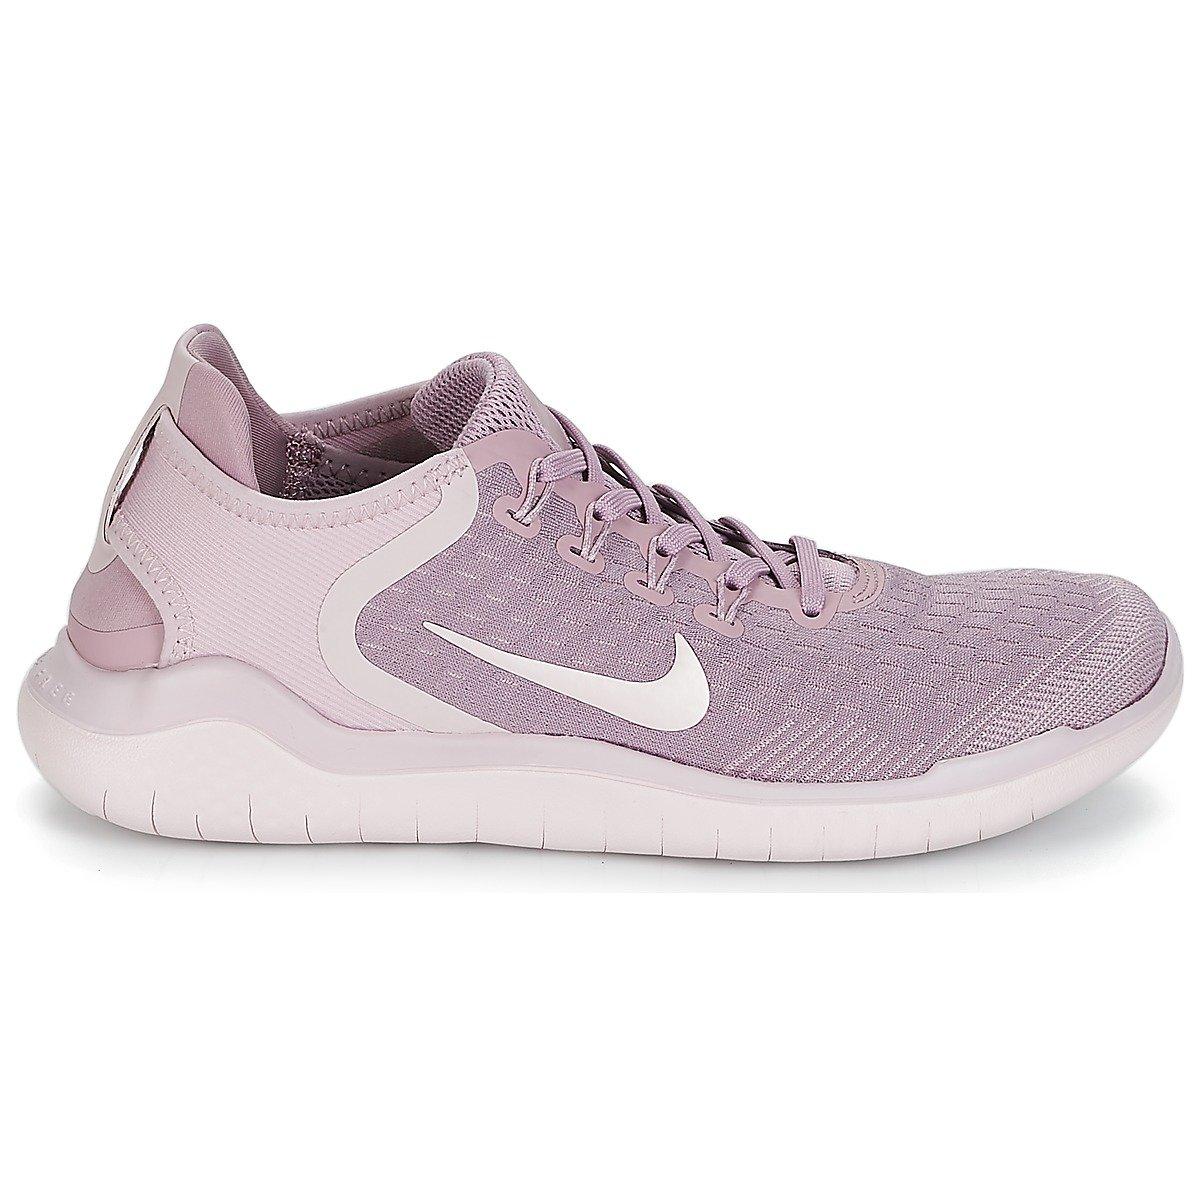 Damenschuhe Elemental RoseGunsmoke Particle Rose Nike Wmns